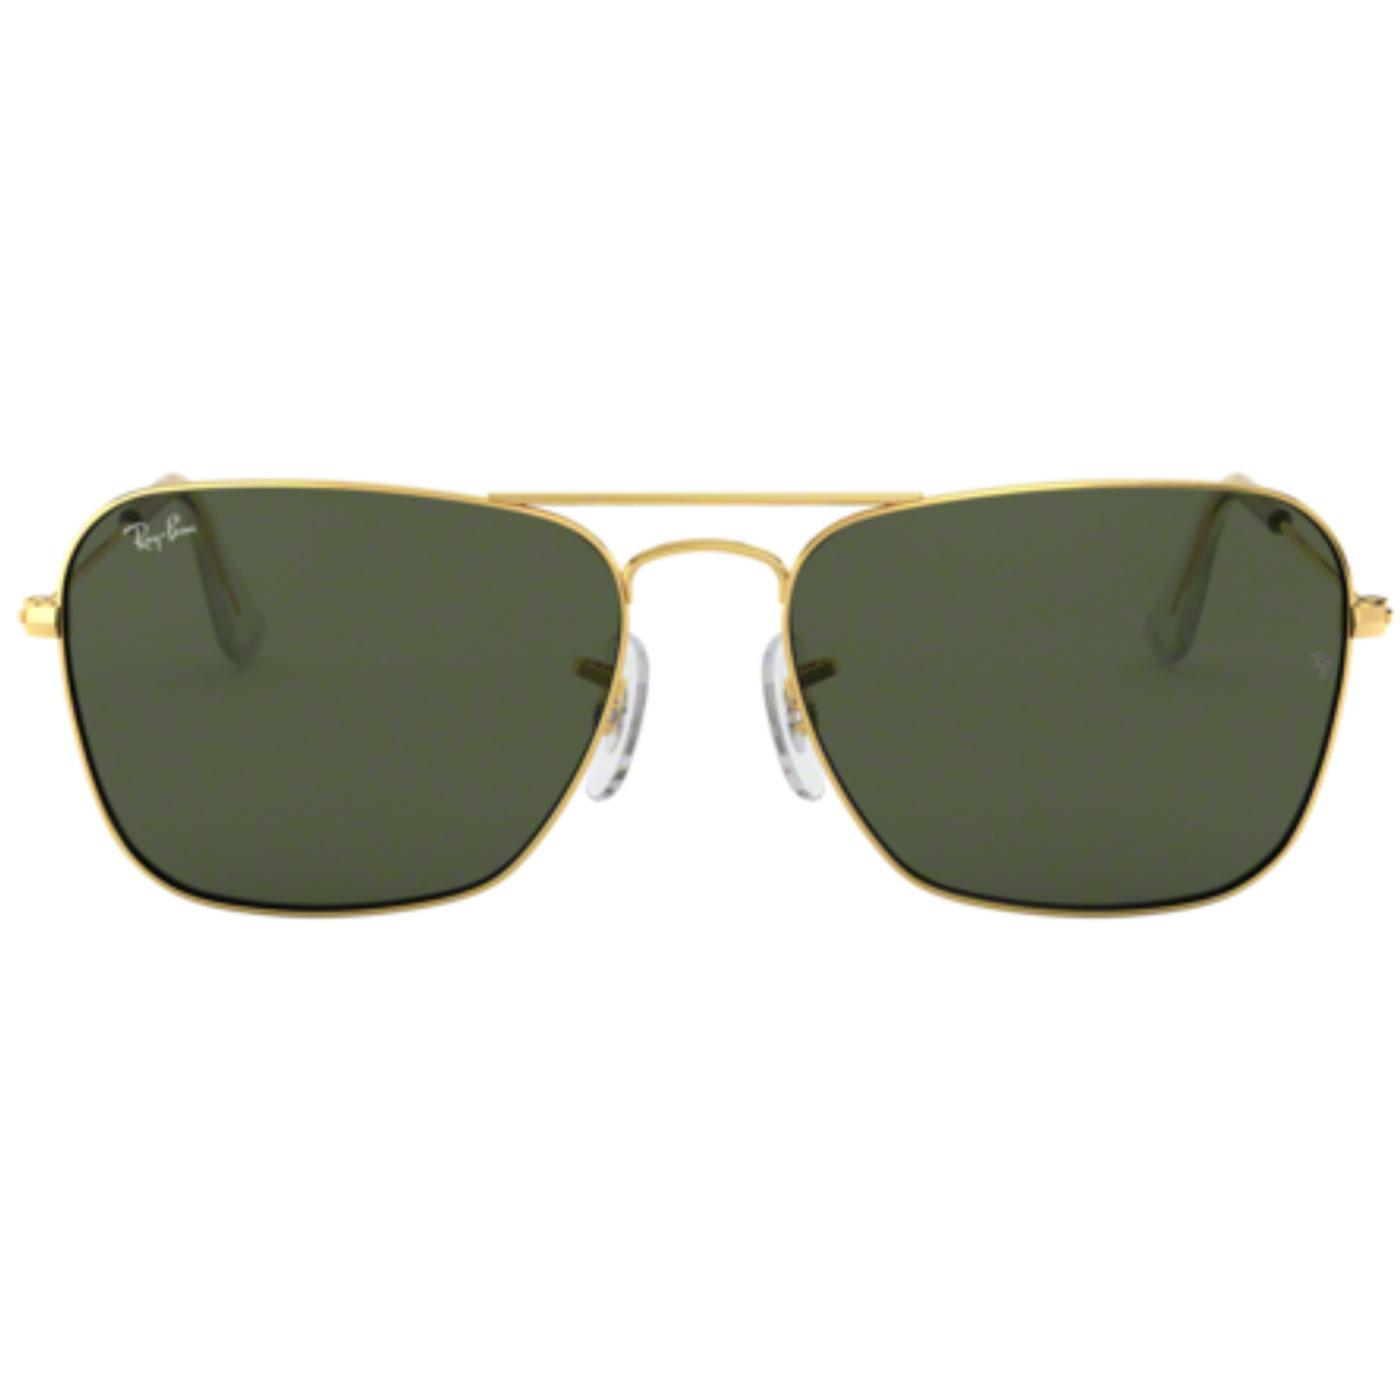 Caravan RAY-BAN Retro 60s Mod Indie Sunglasses (G)